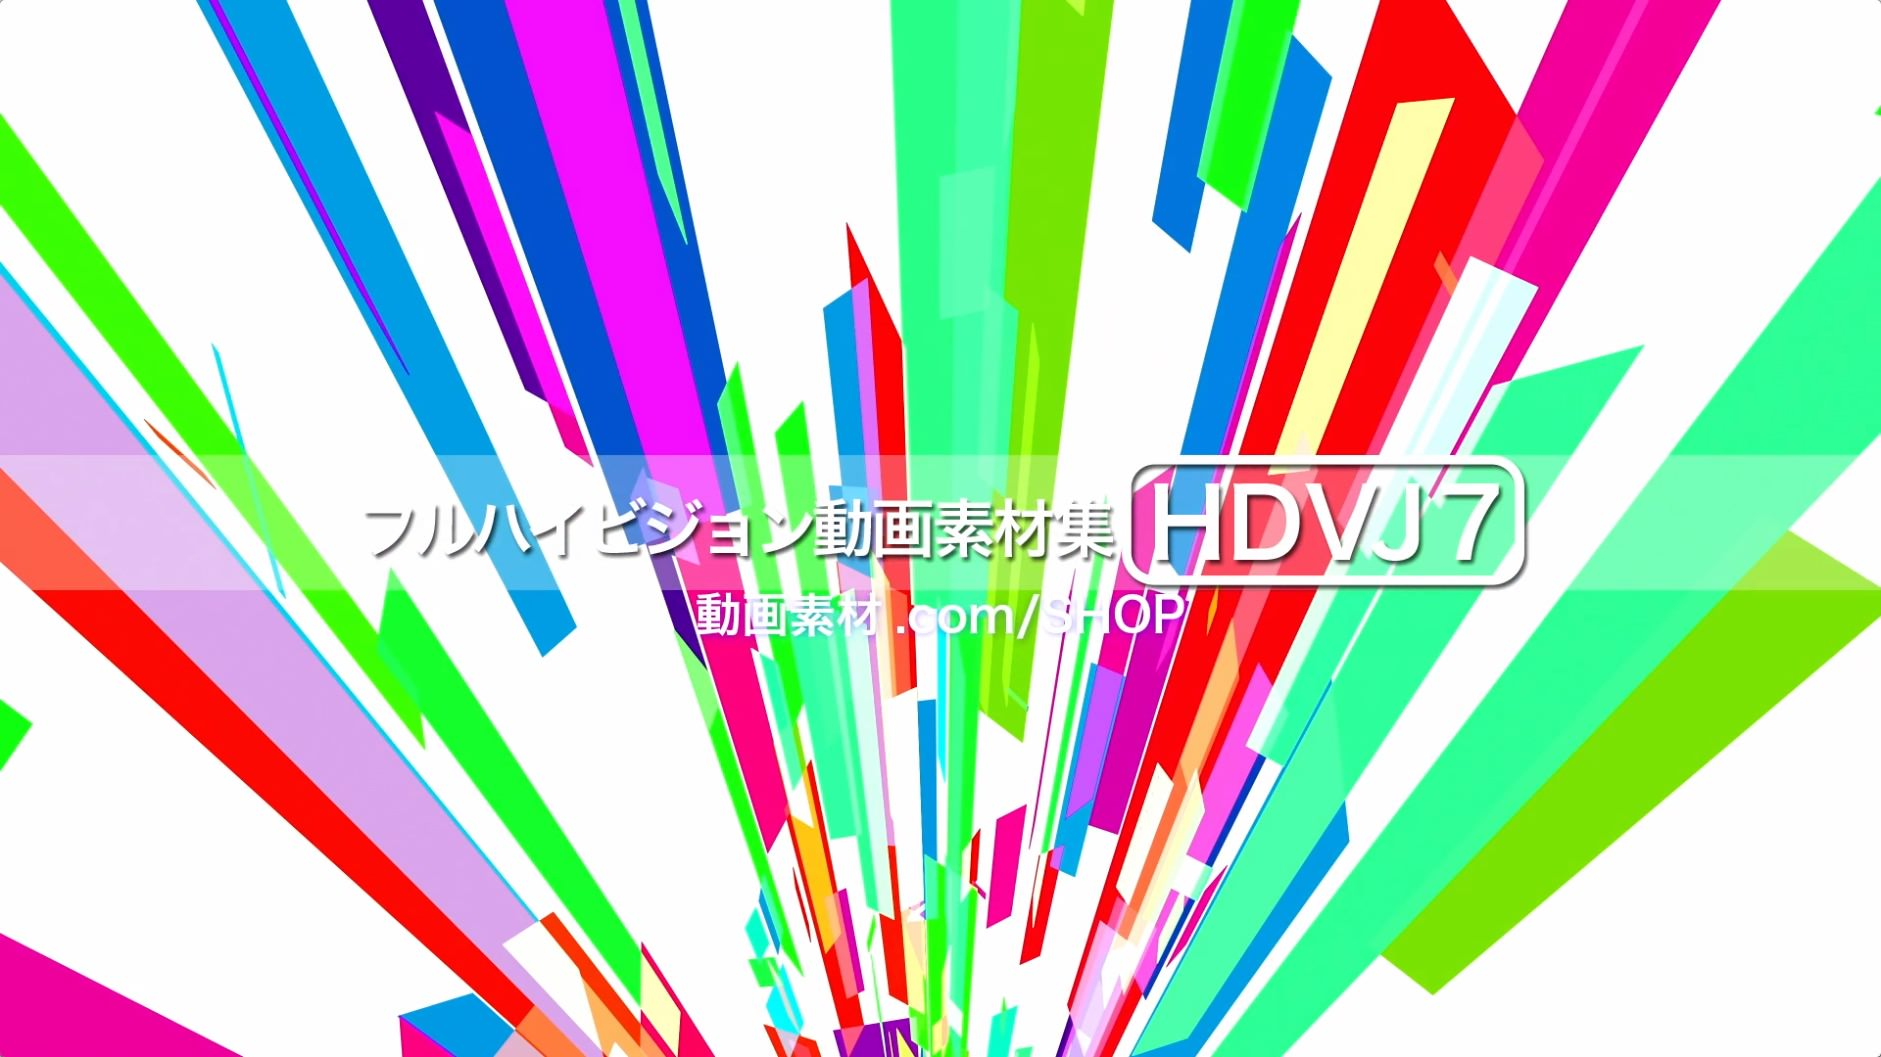 MovieMaterial HDVJ7 フルハイビジョンVJ動画素材集 画像4